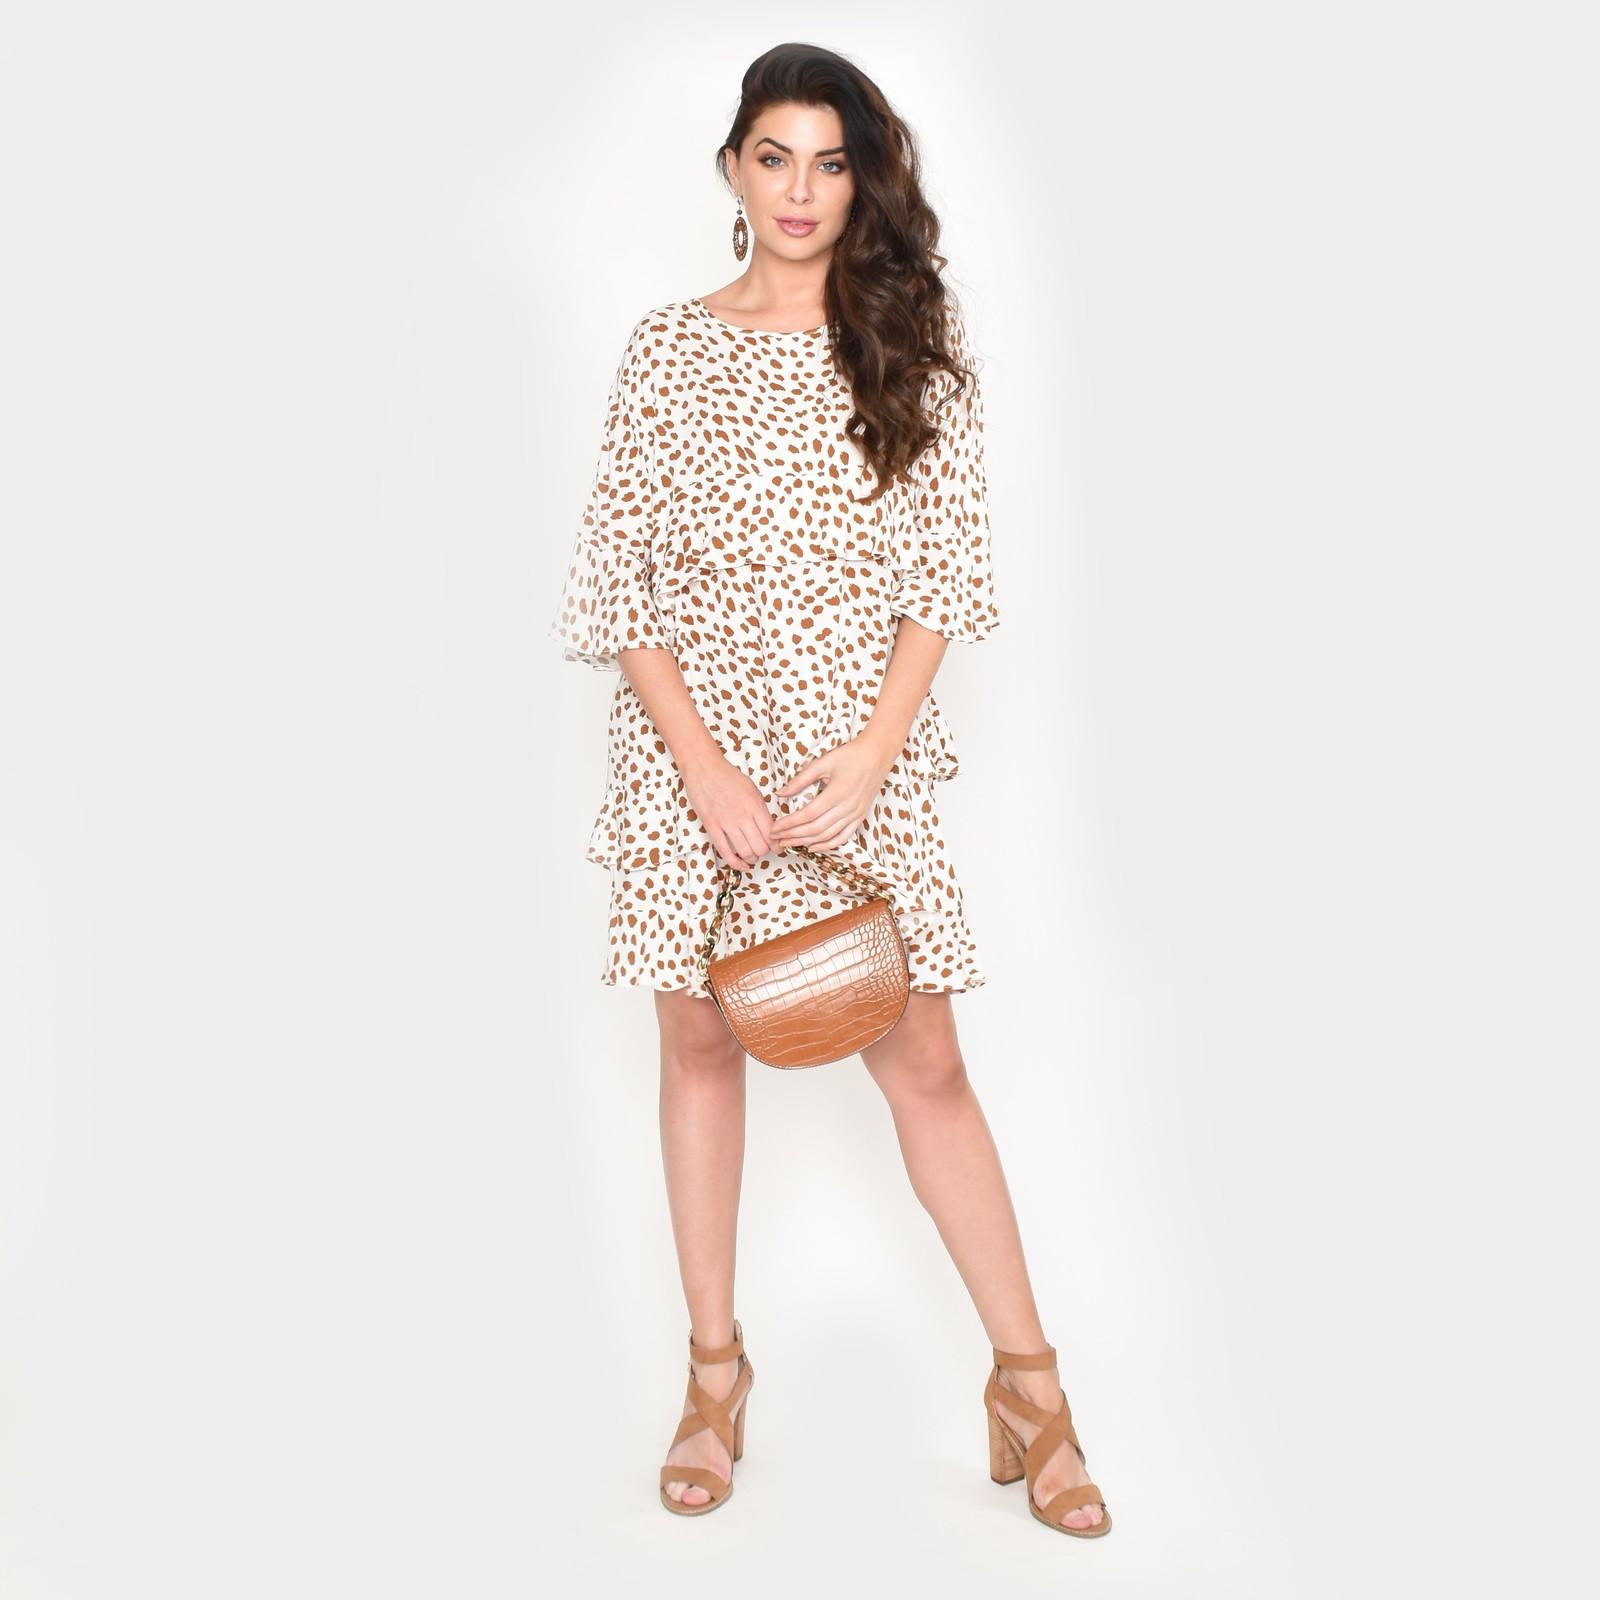 Adorne: Lozzy Frill Dress Animal Print - S/M image